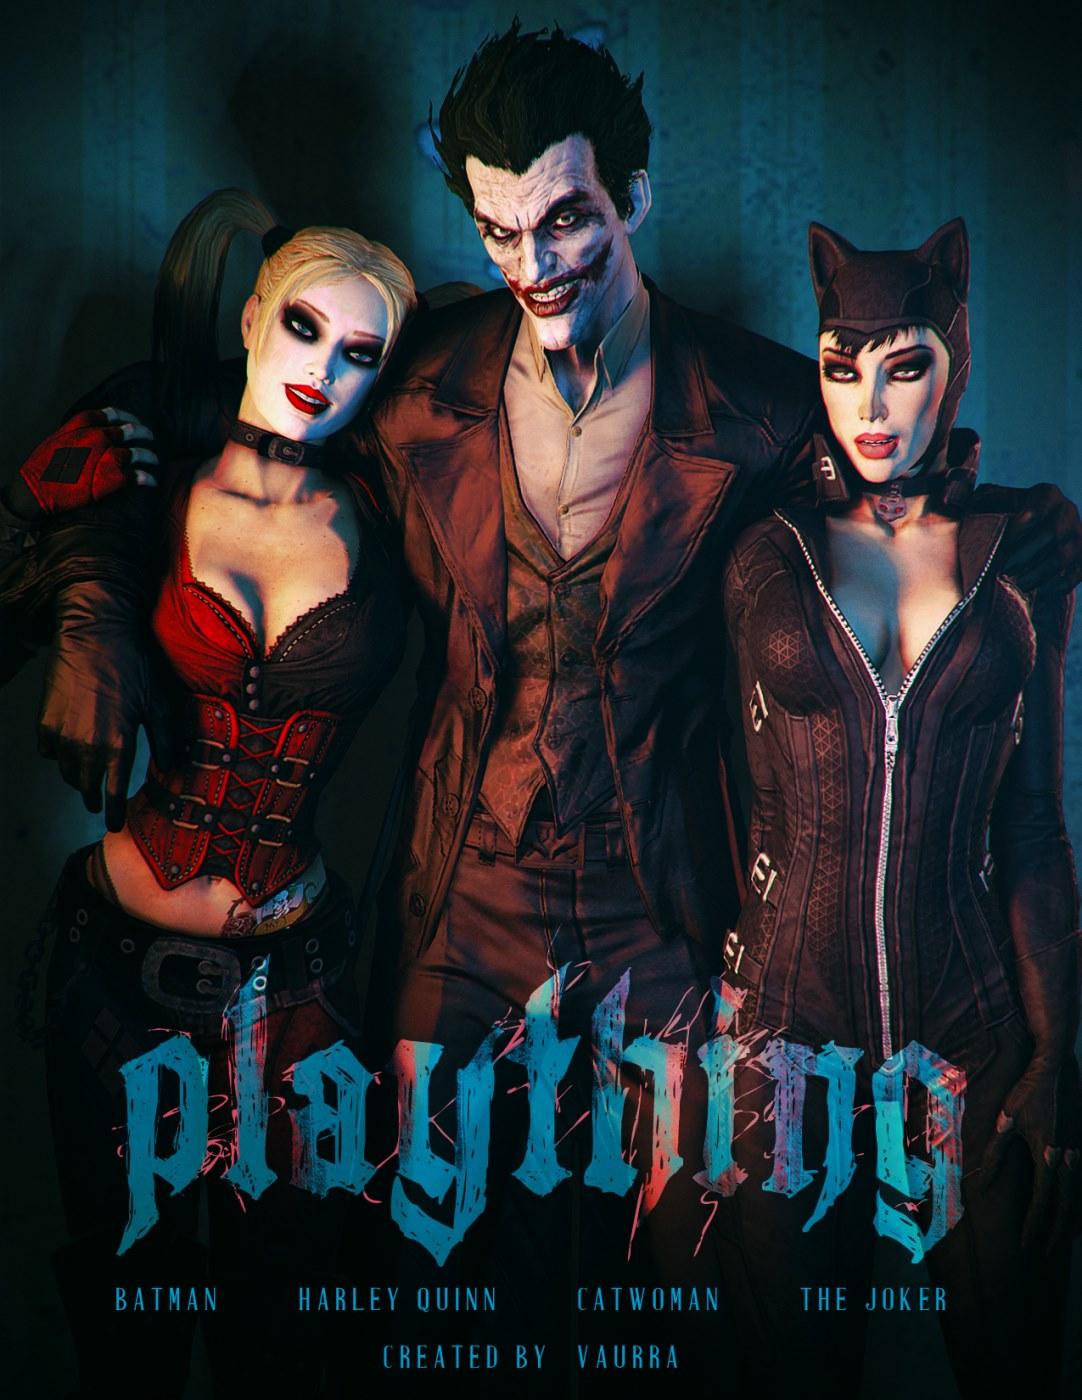 Batman & Harley Quinn- Plaything (Vaurra) porn comics 8 muses